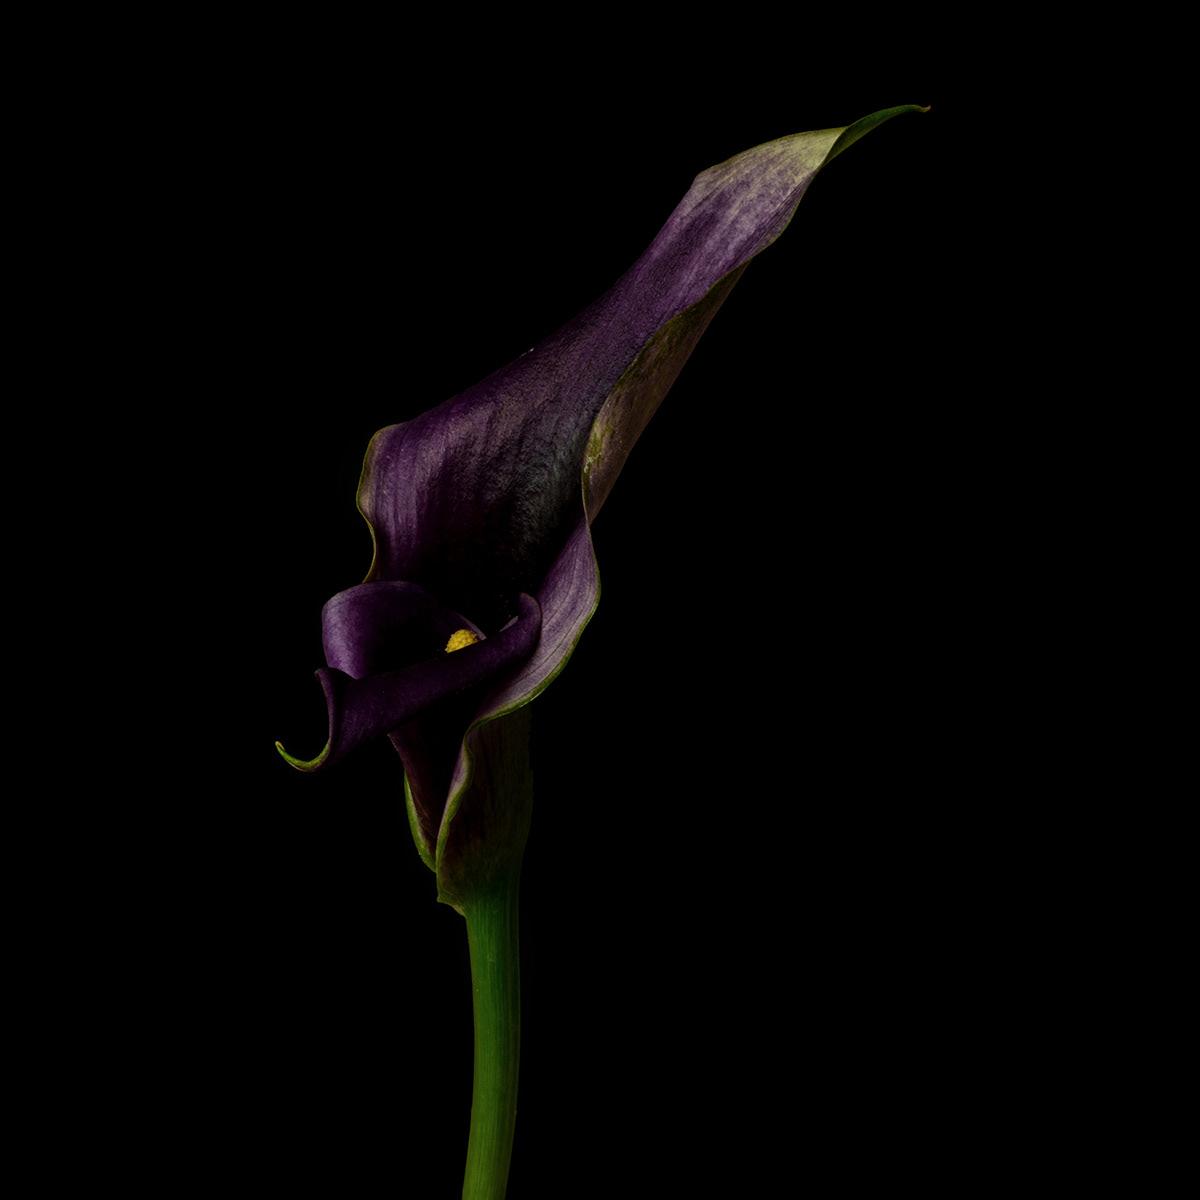 Calla Lily / фото Bettina Güber